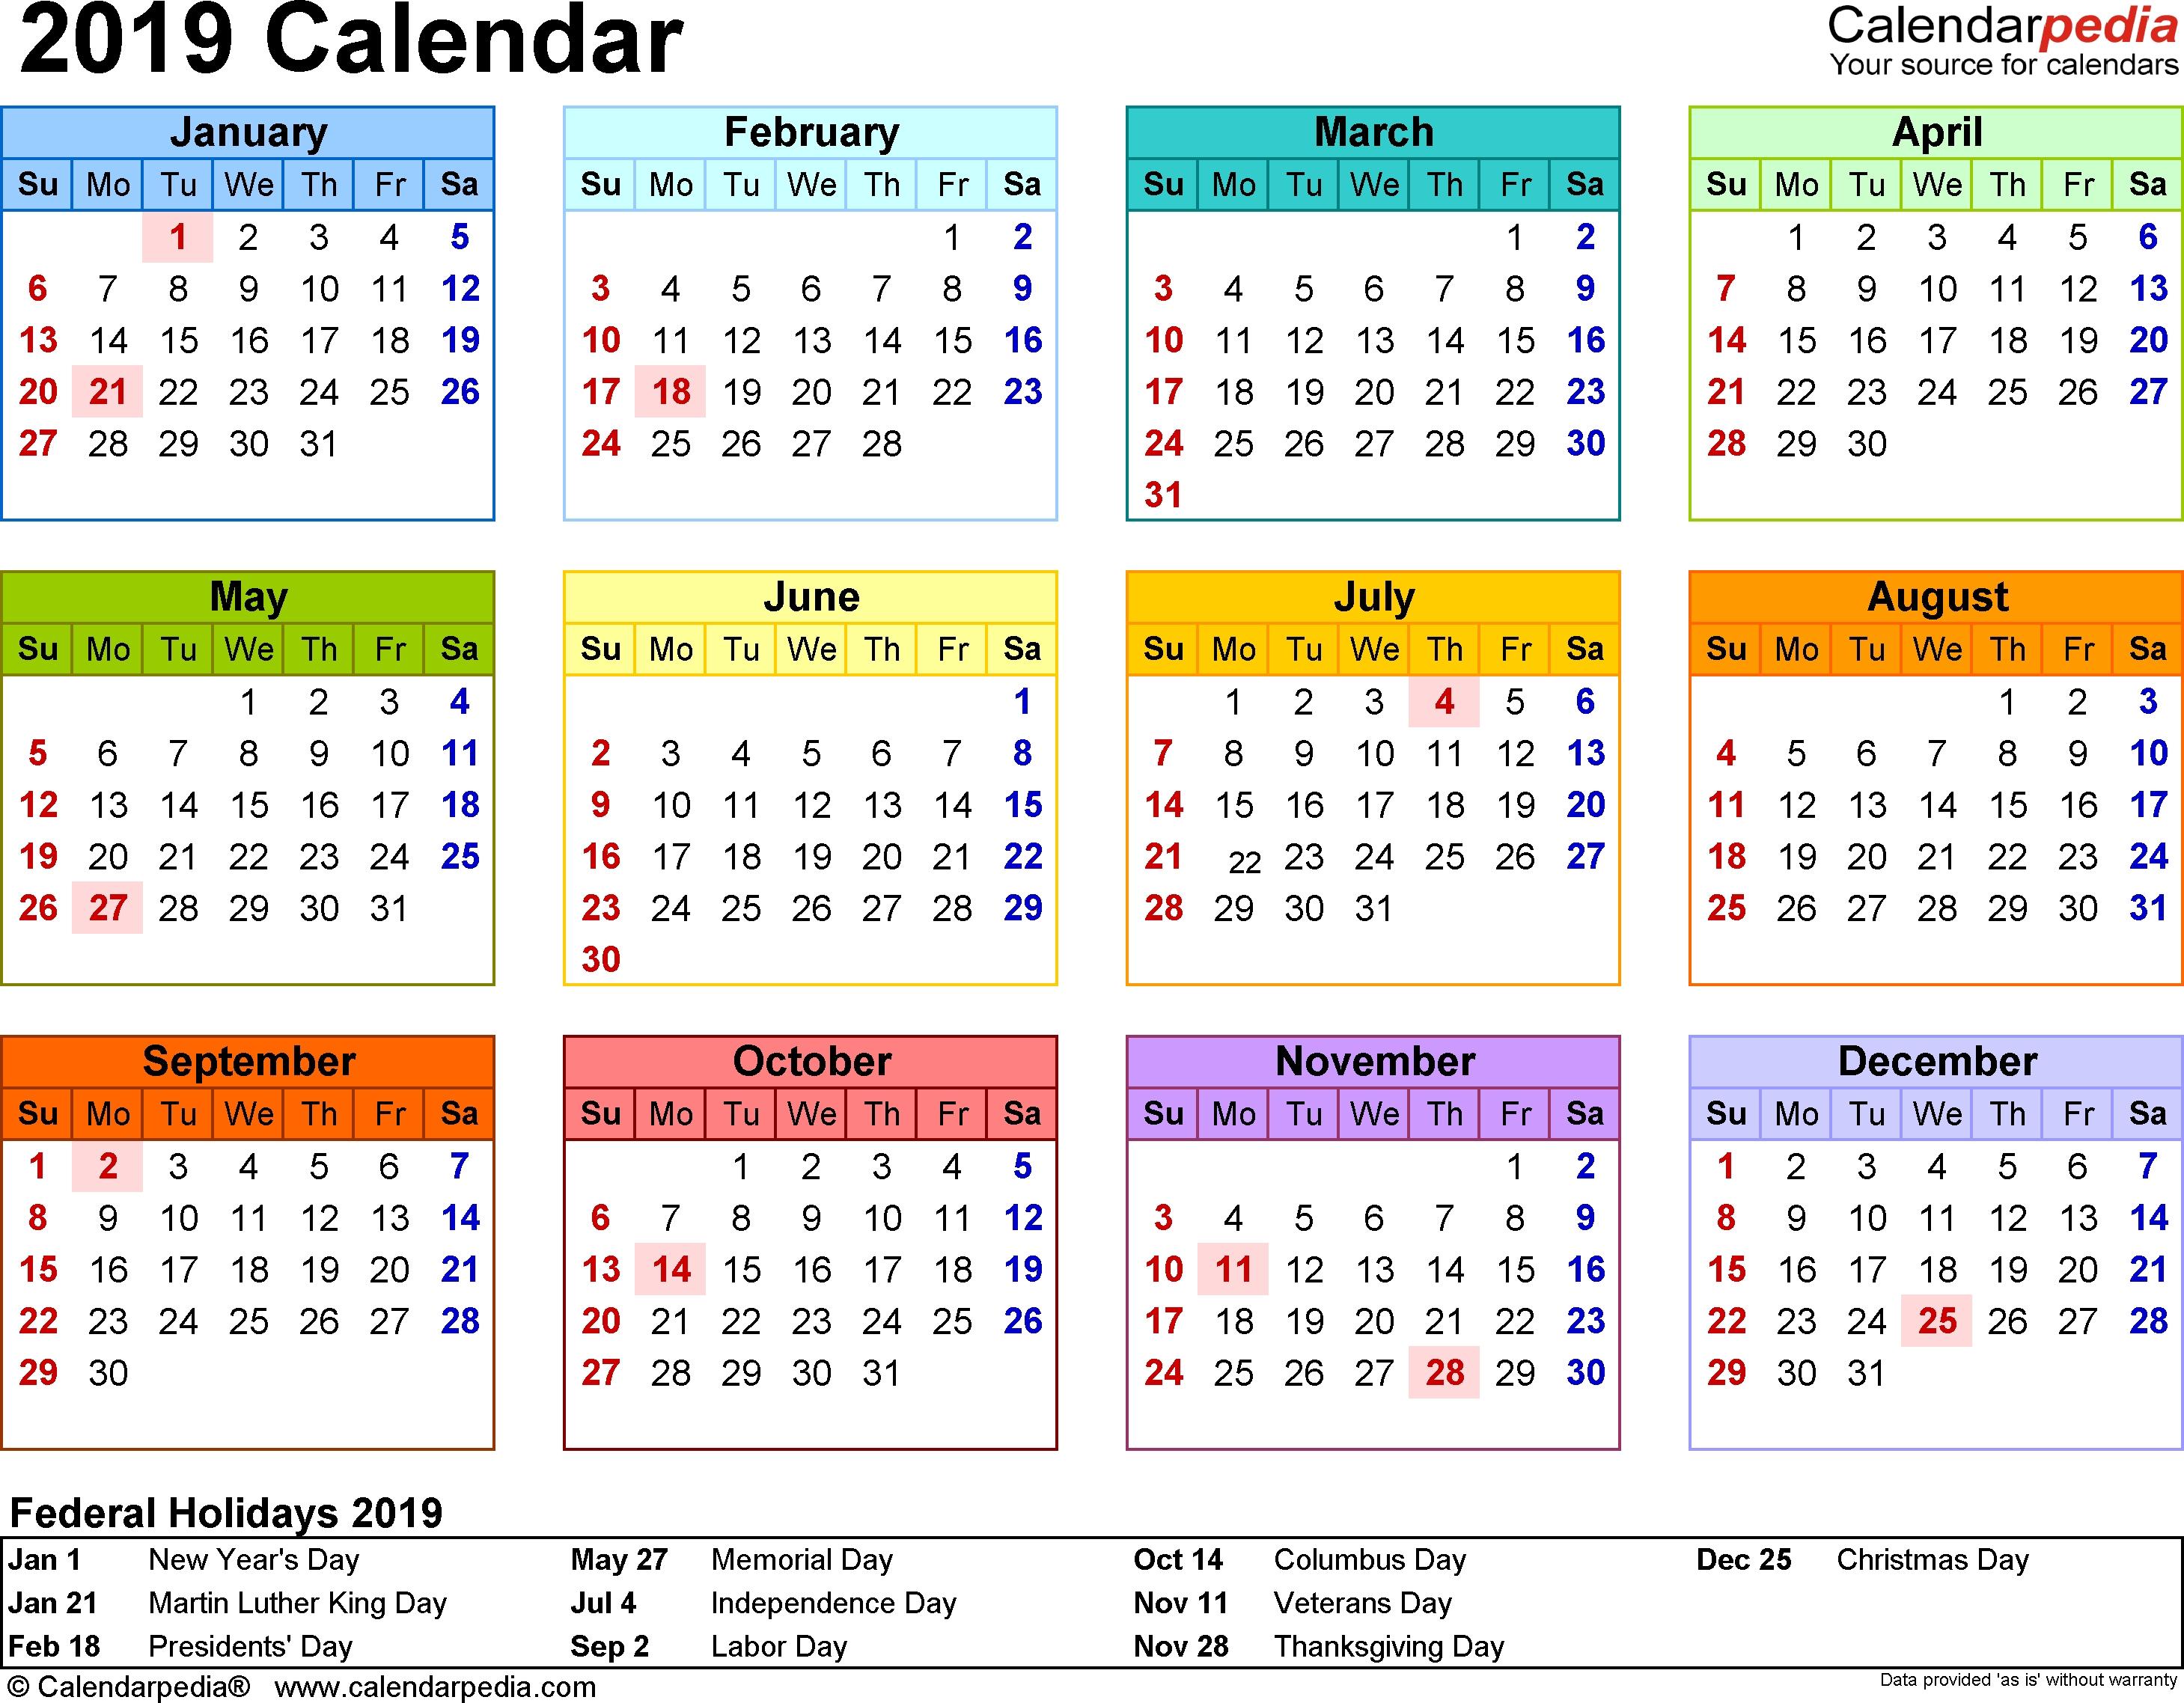 2019 Calendar - Download 18 Free Printable Excel Templates-Excel Template Countdown Calendar